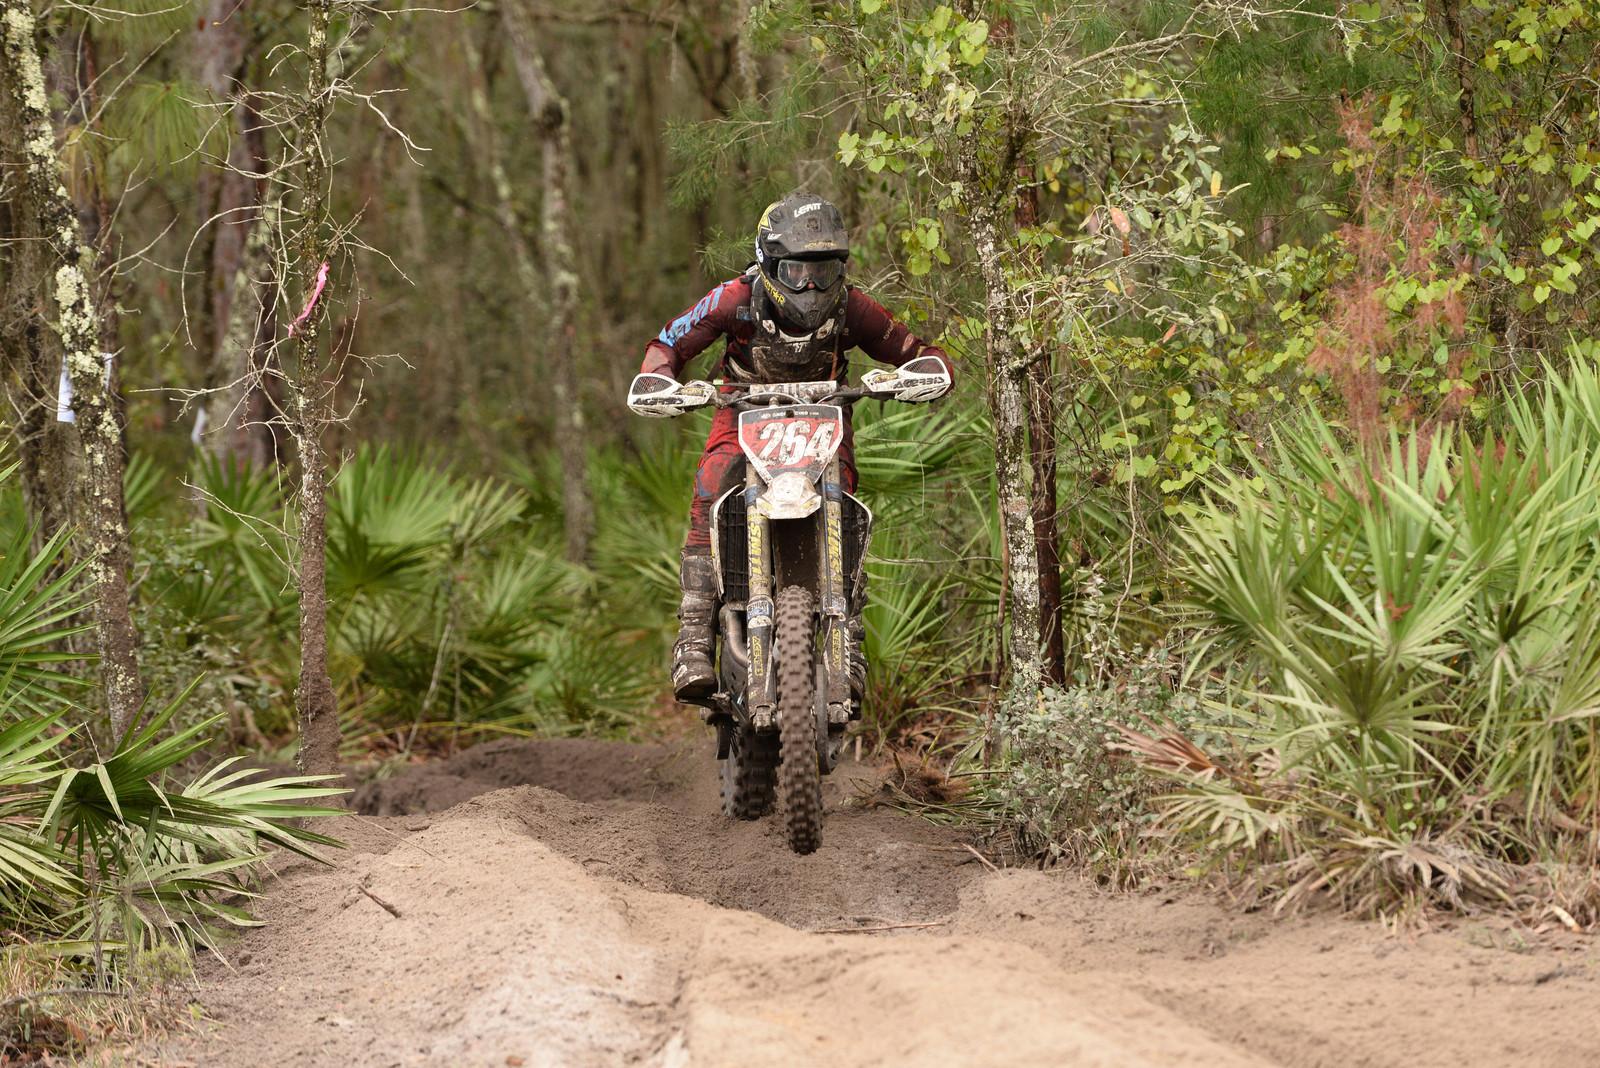 Ryan Sipes - Wild Boar GNCC - Motocross Pictures - Vital MX